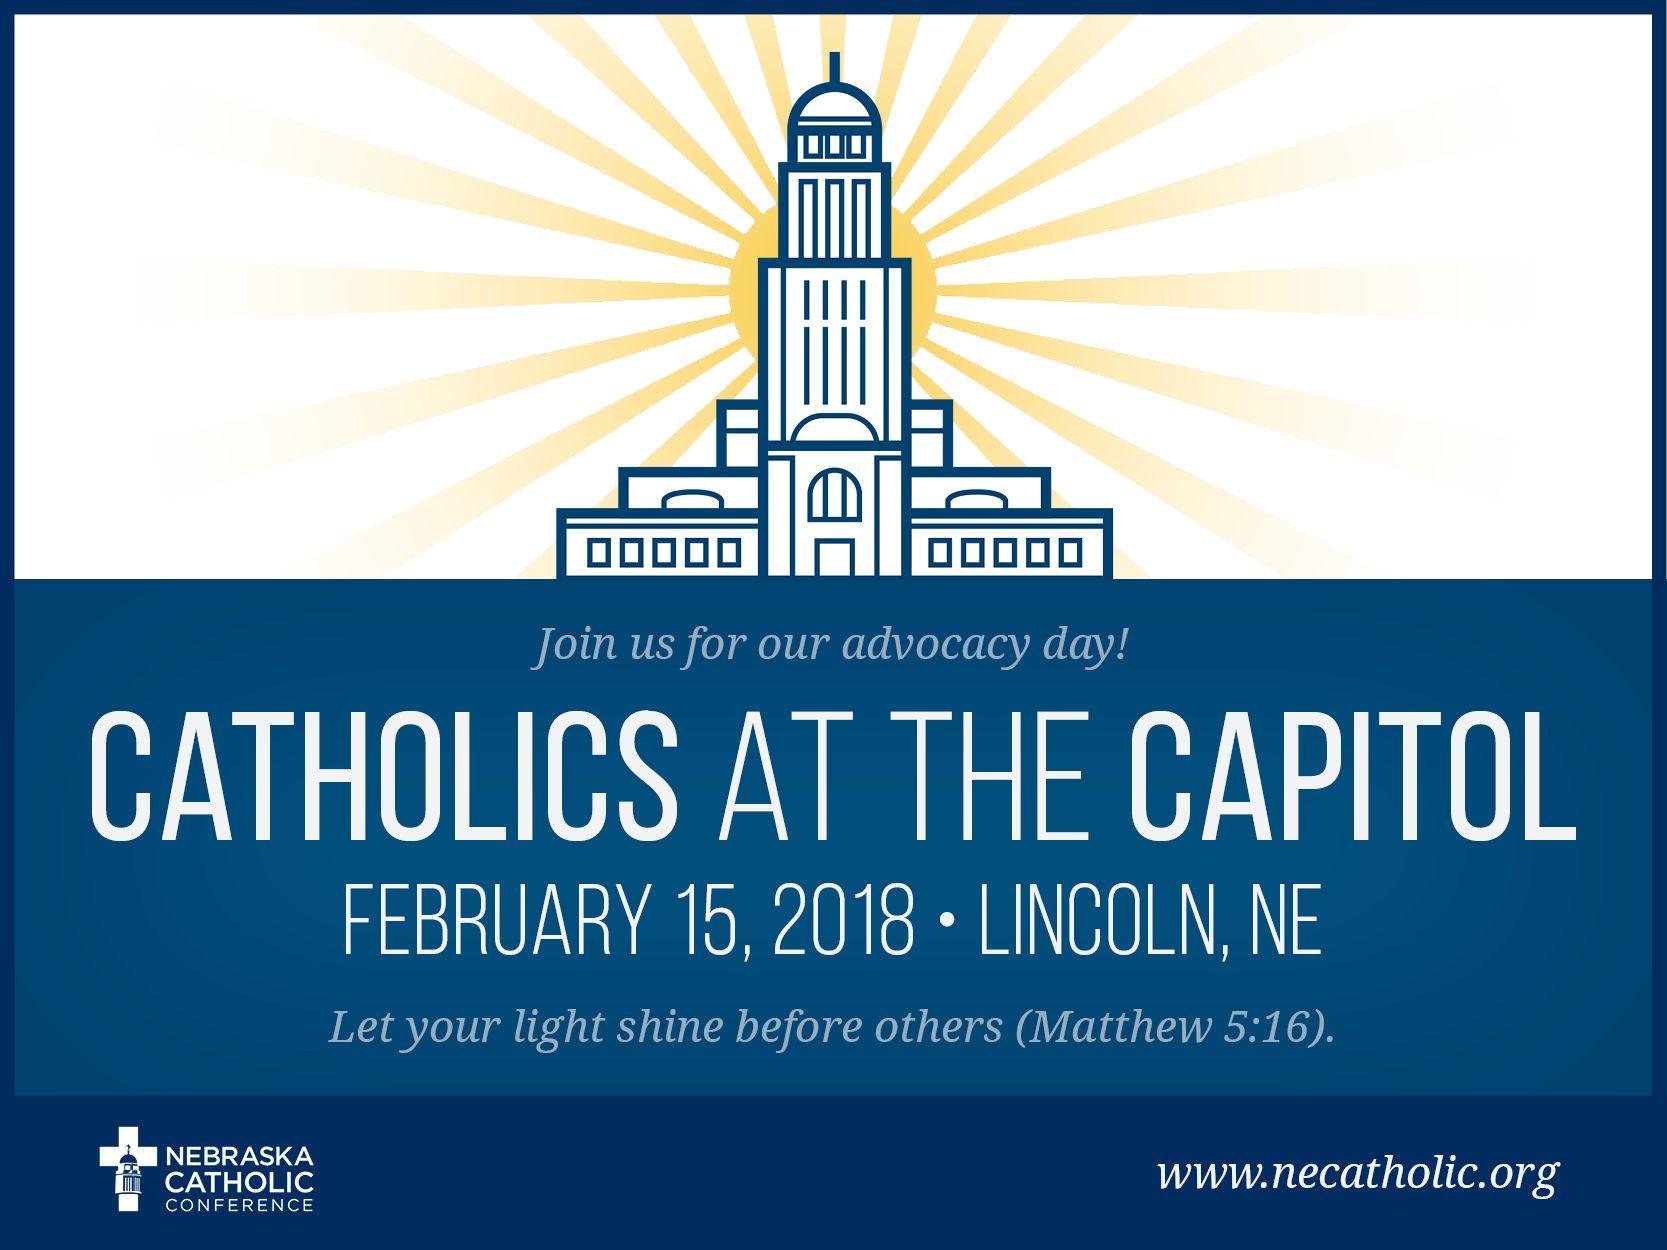 Catholics at the Capitol